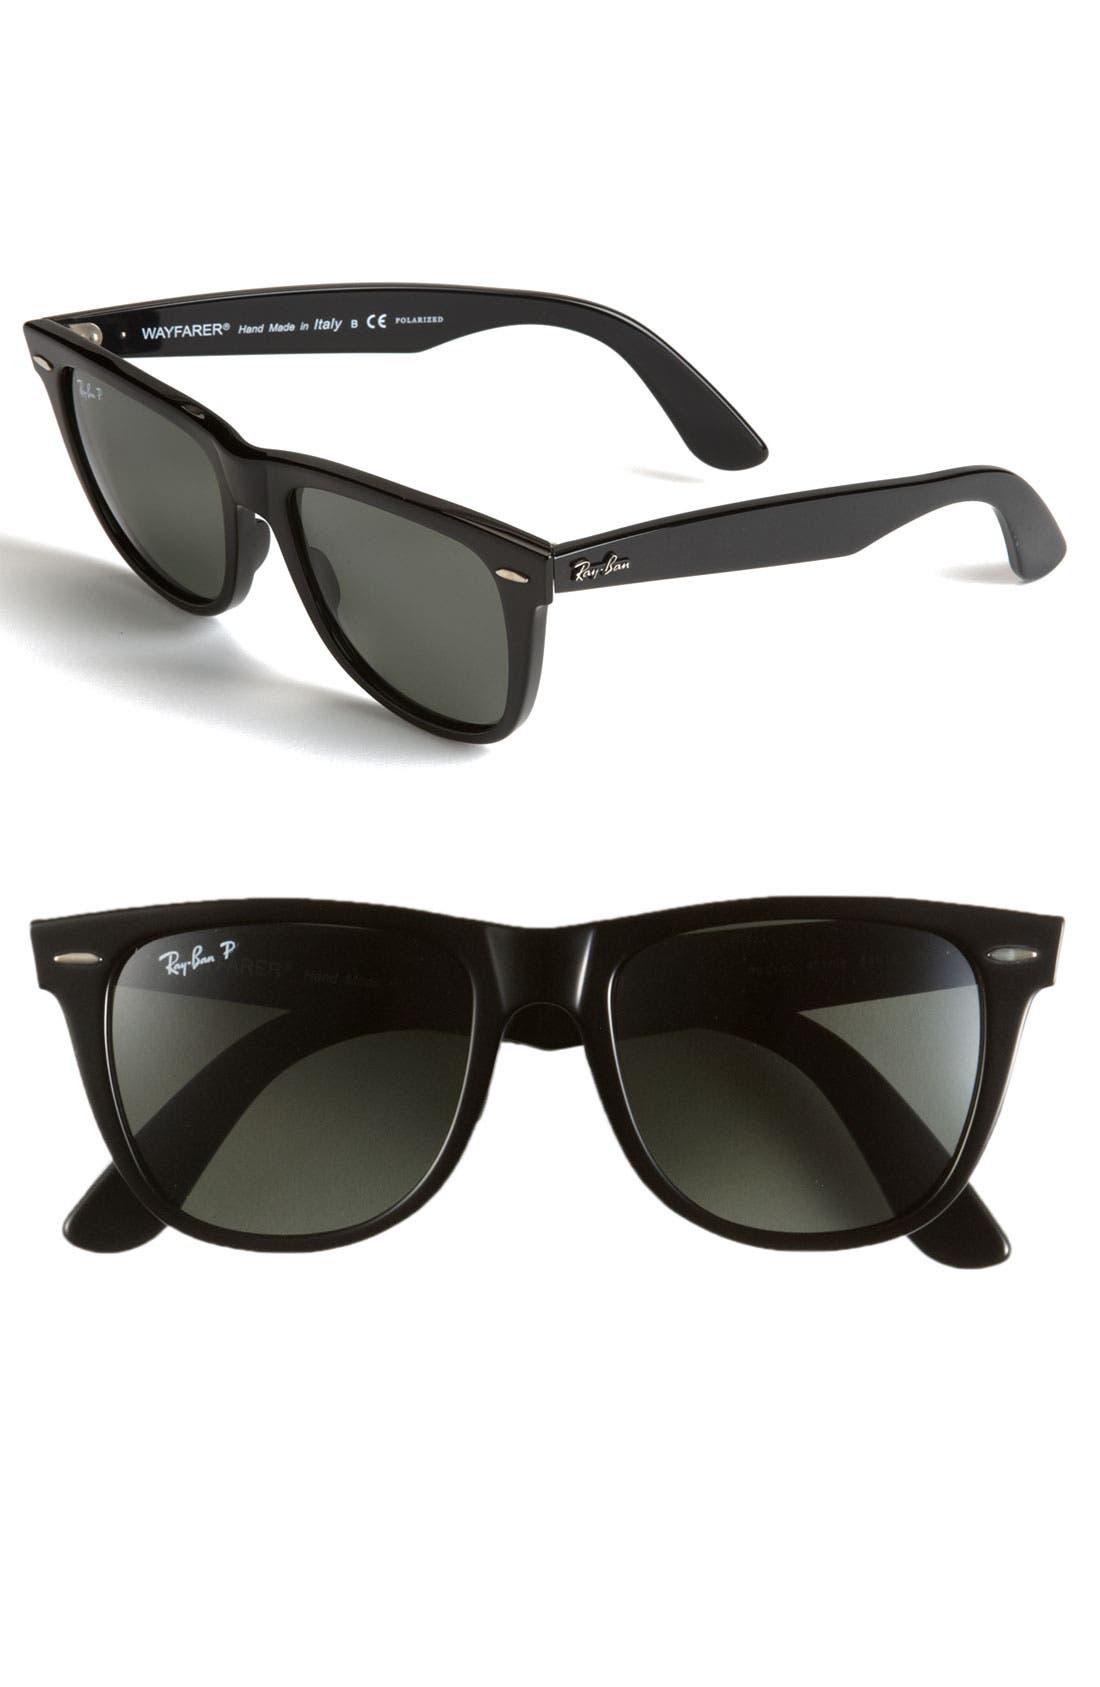 Alternate Image 1 Selected - Ray-Ban 'Classic Wayfarer' Polarized 54mm Sunglasses